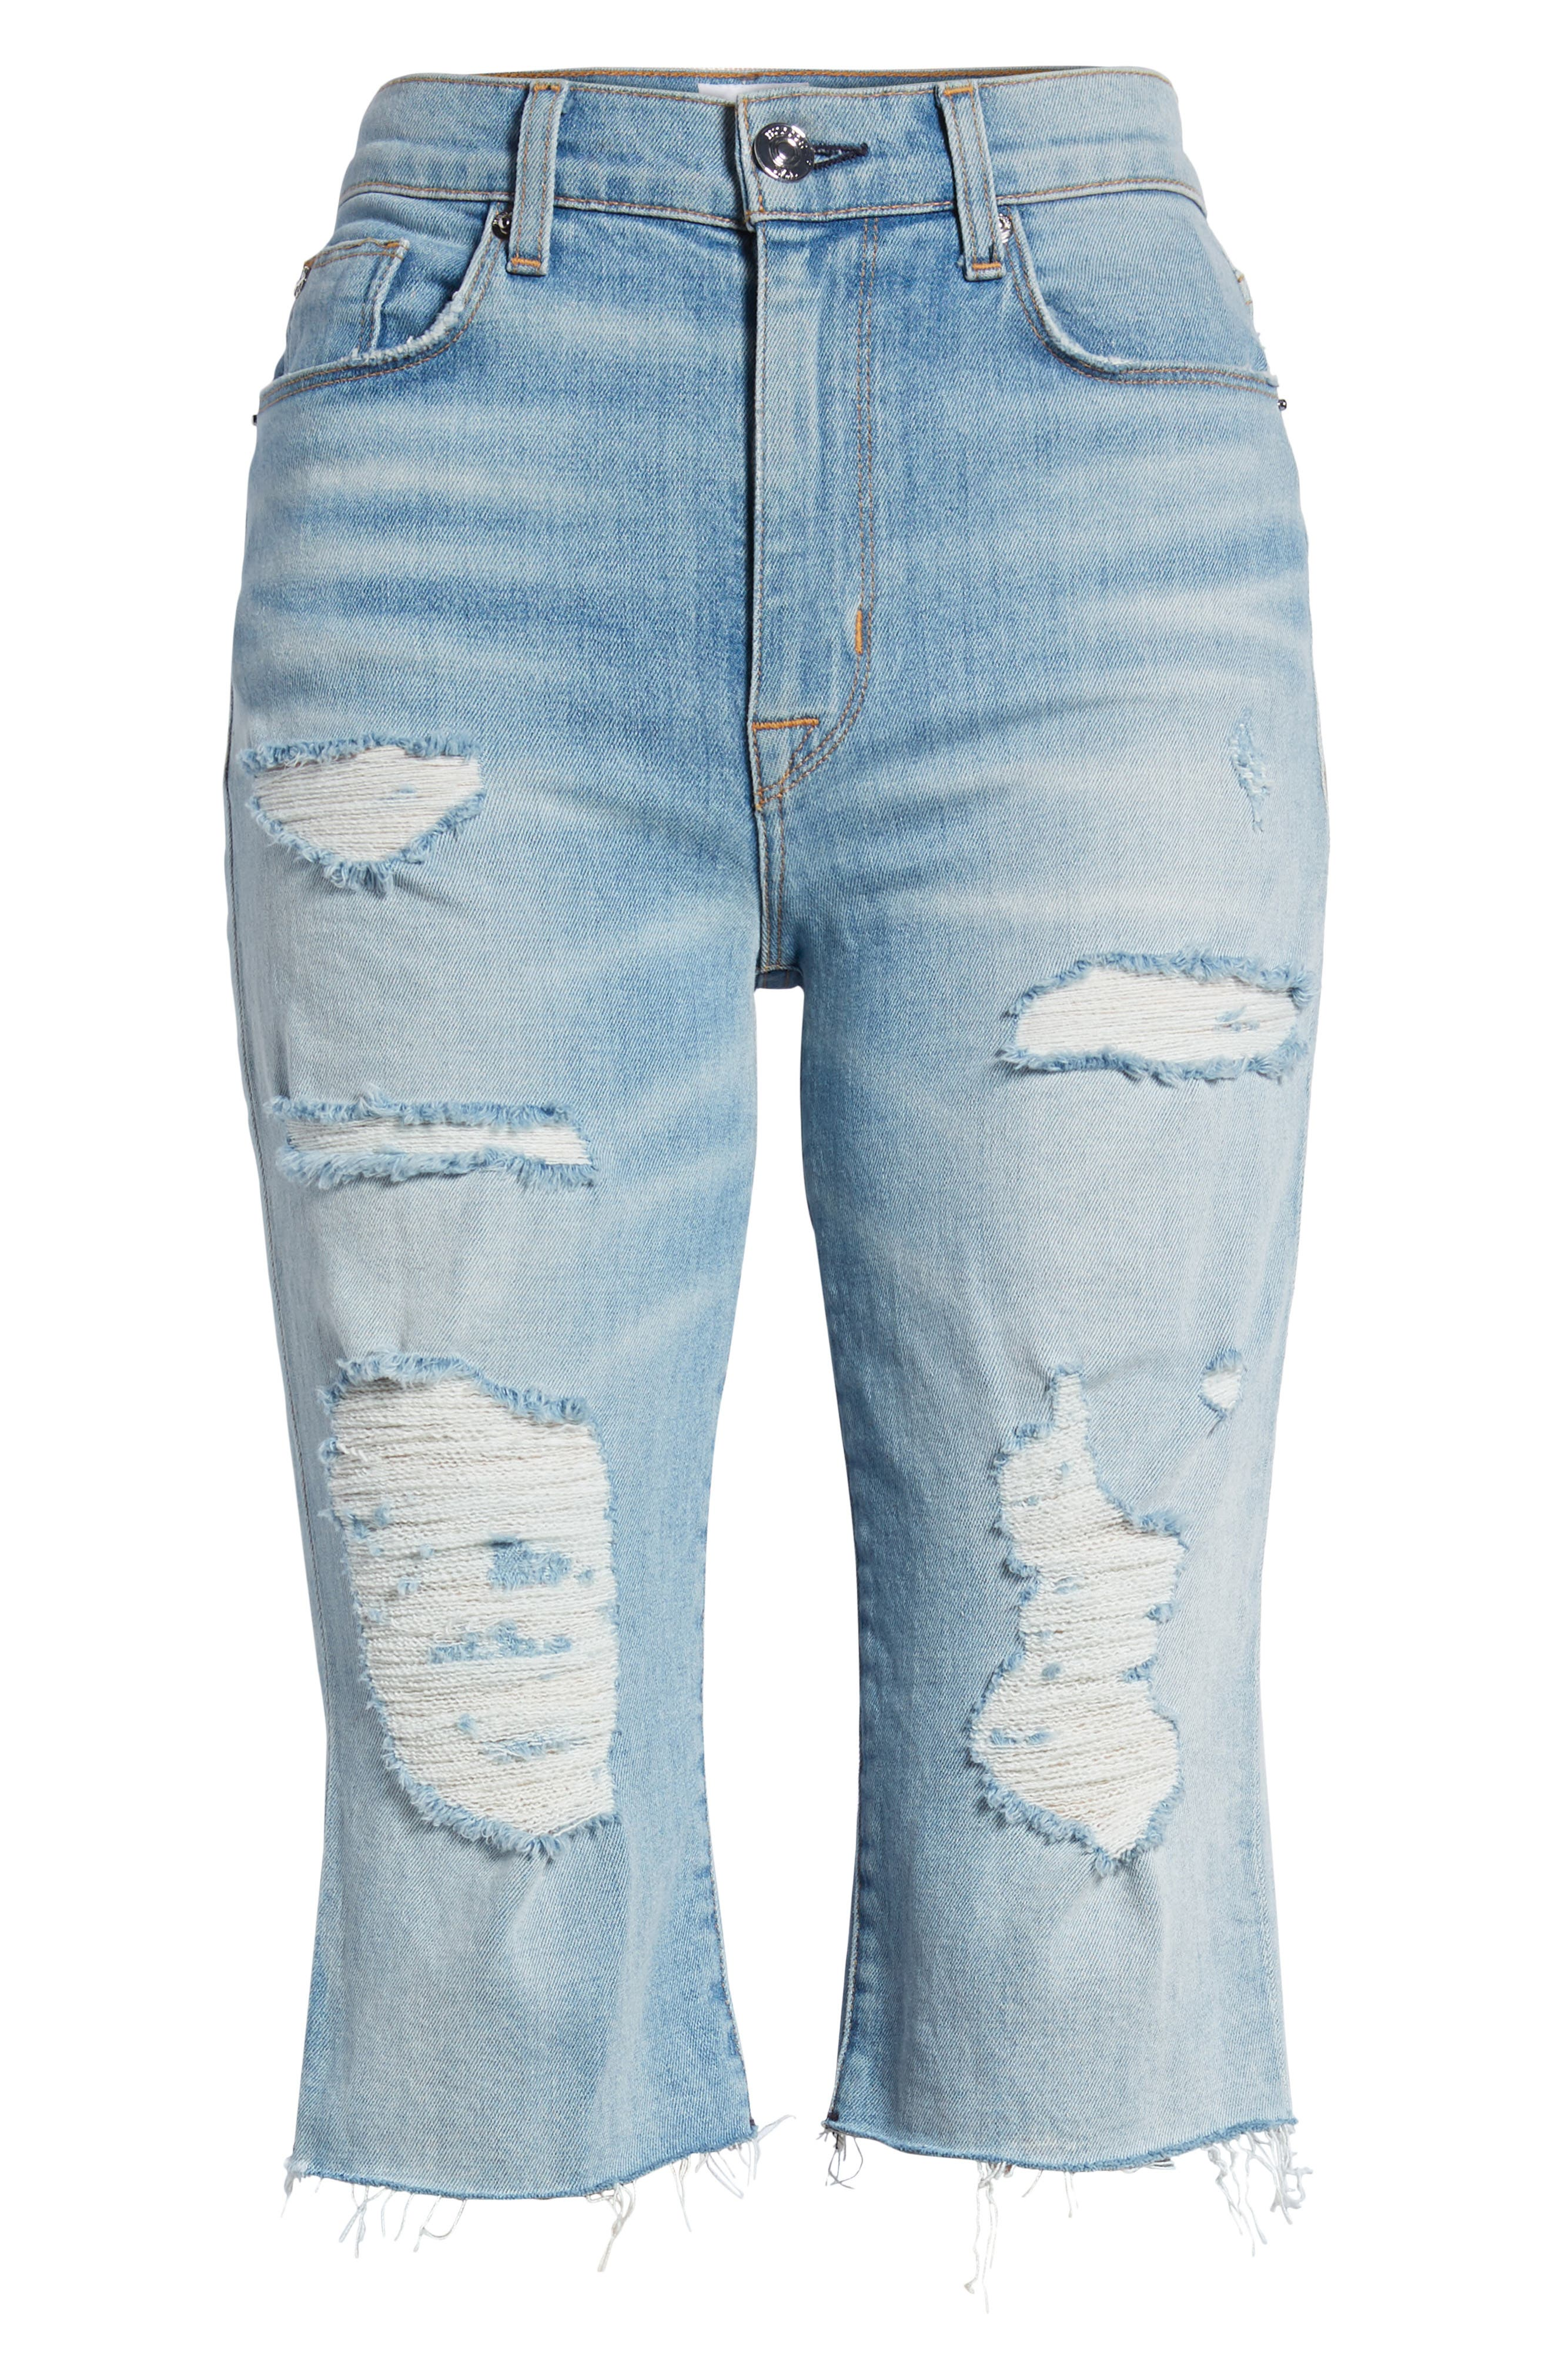 Zoeey High Waist Cutoff Boyfriend Shorts,                             Alternate thumbnail 7, color,                             420